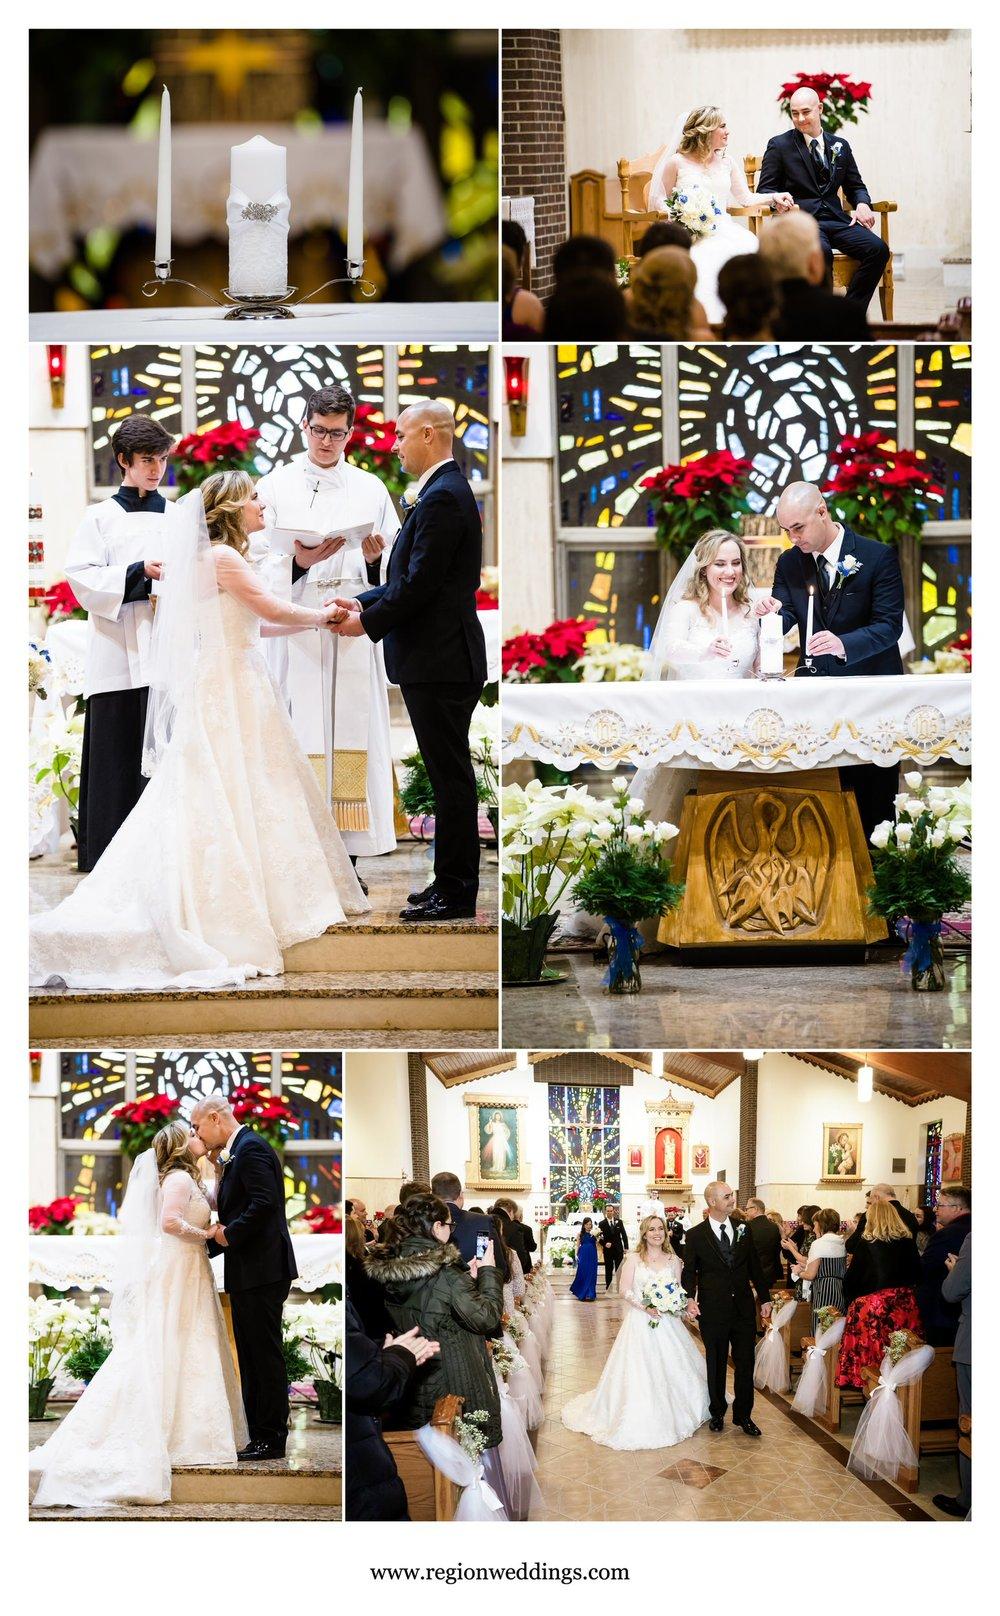 Wedding ceremony at Carmelite Fathers.